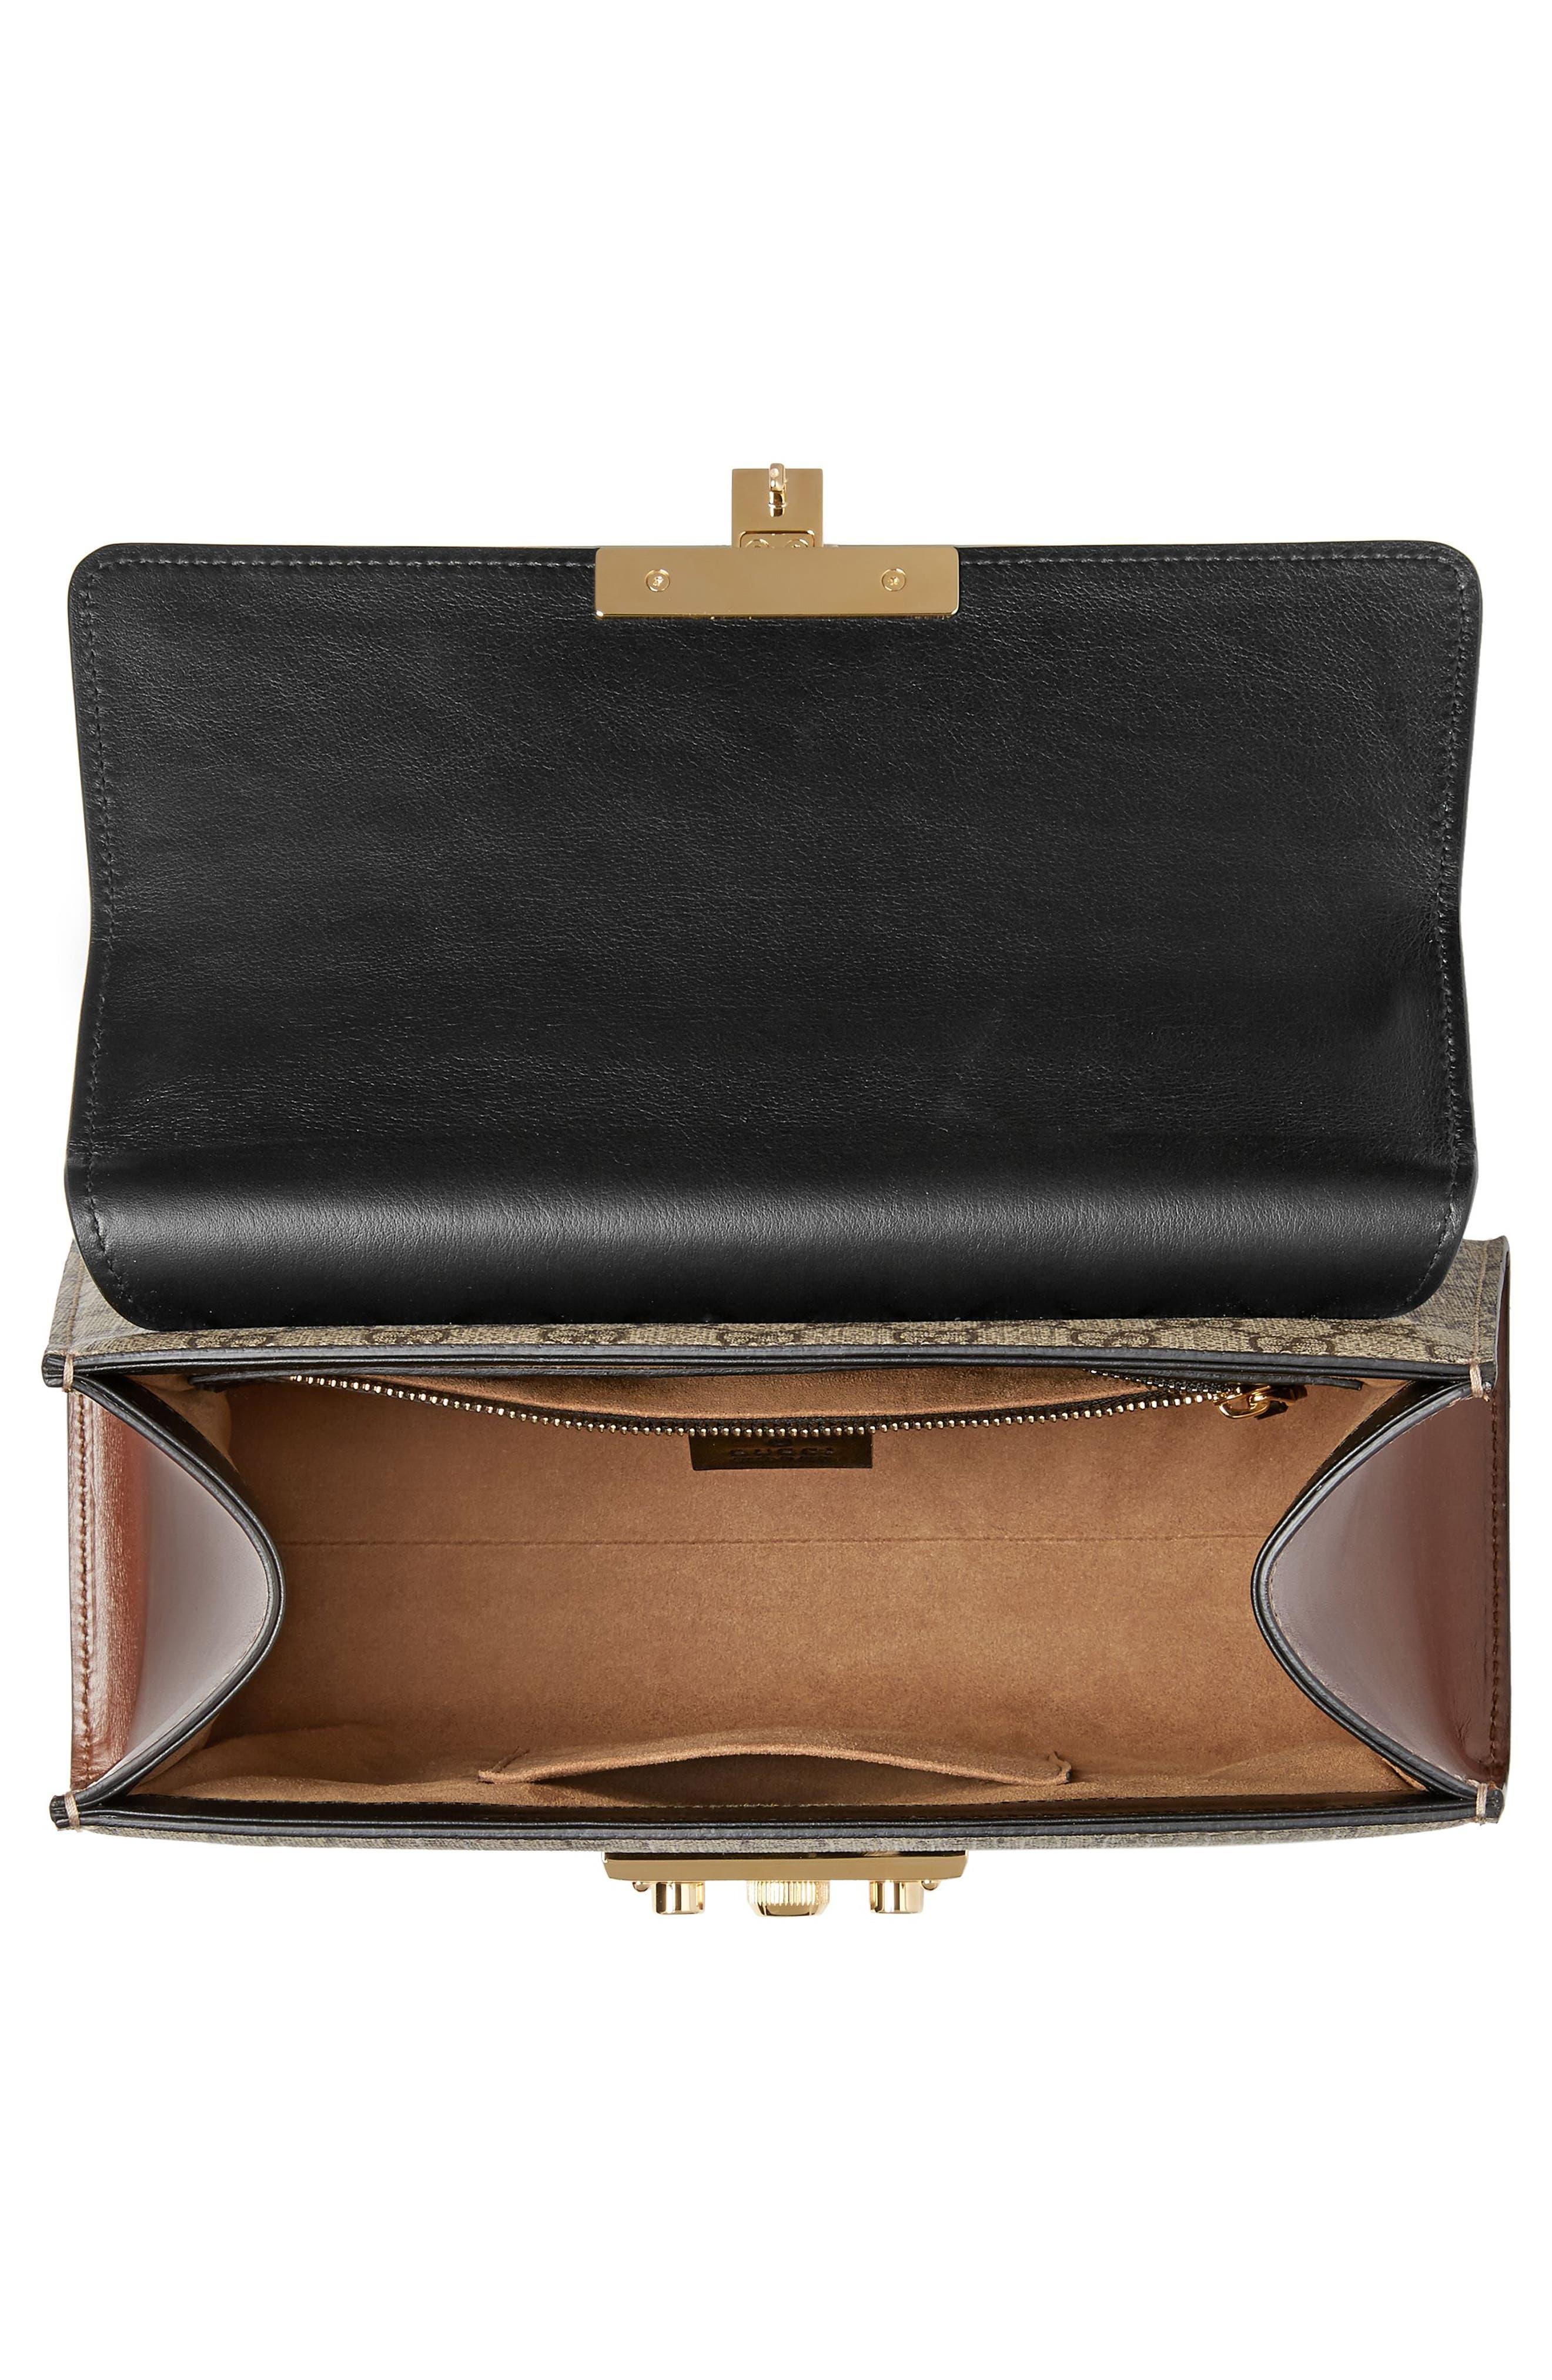 Small Padlock GG Supreme Canvas & Leather Top Handle Satchel,                             Alternate thumbnail 3, color,                             BEIGE EBONY/ NERO/ TOSCANO